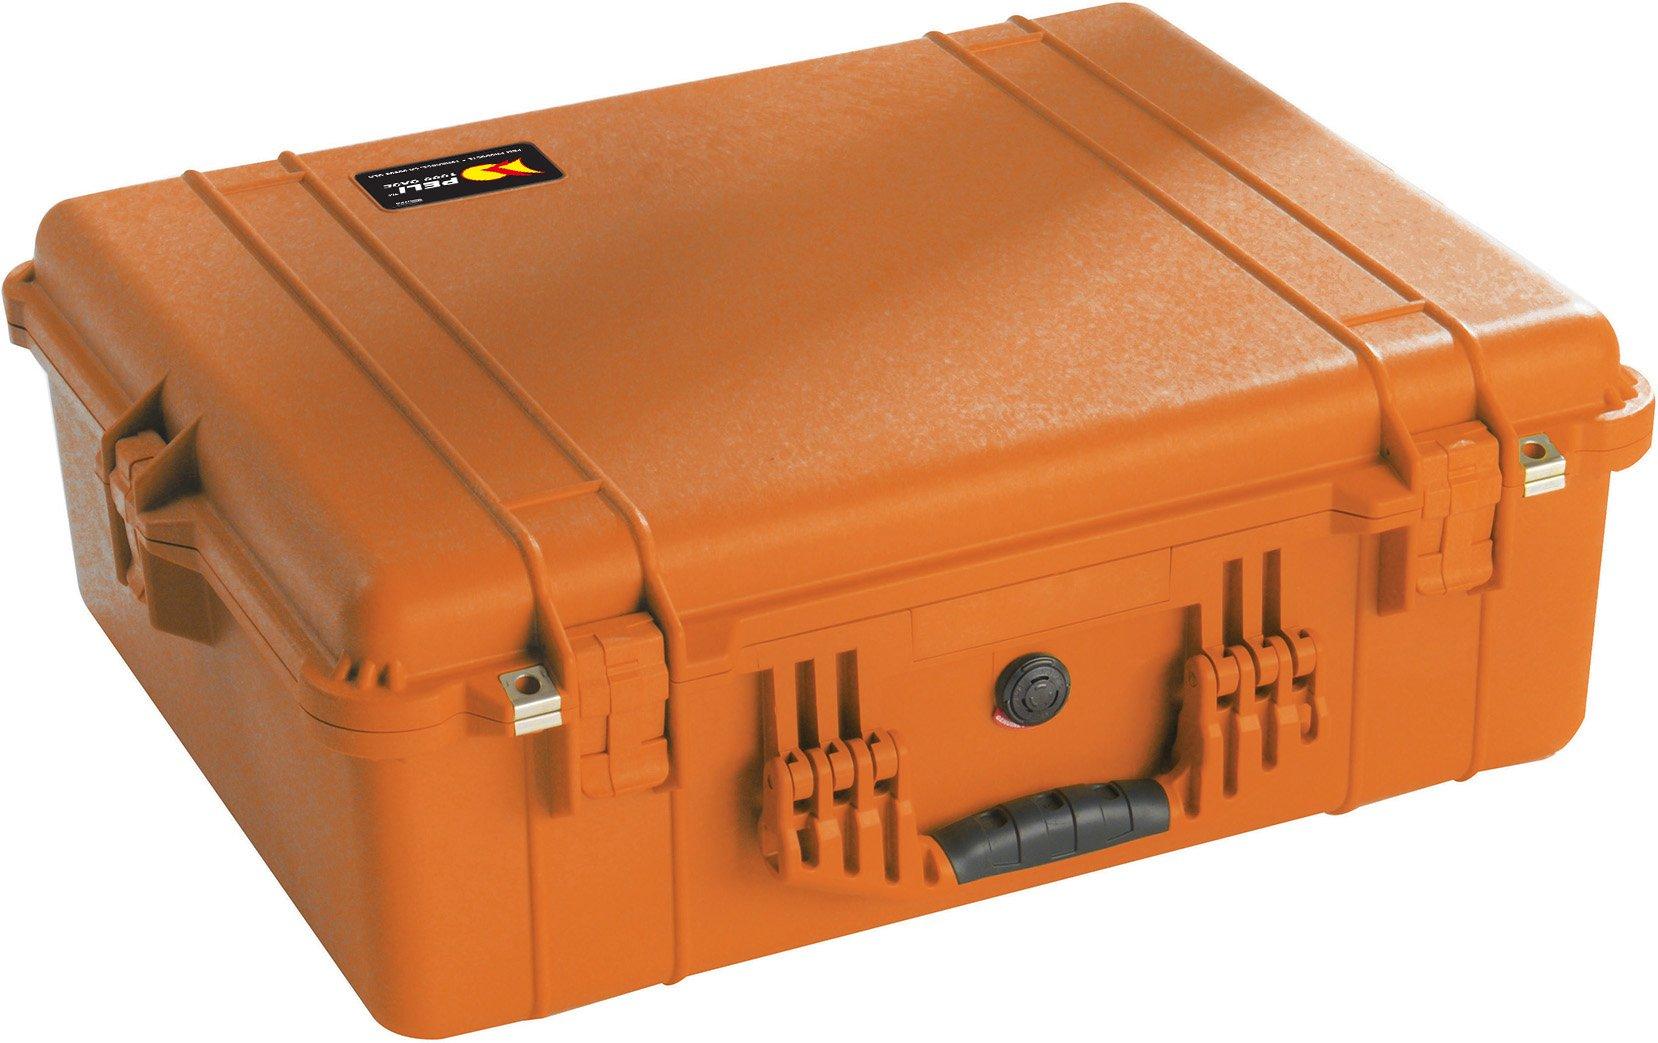 Peli 1600 with Foam, Orange